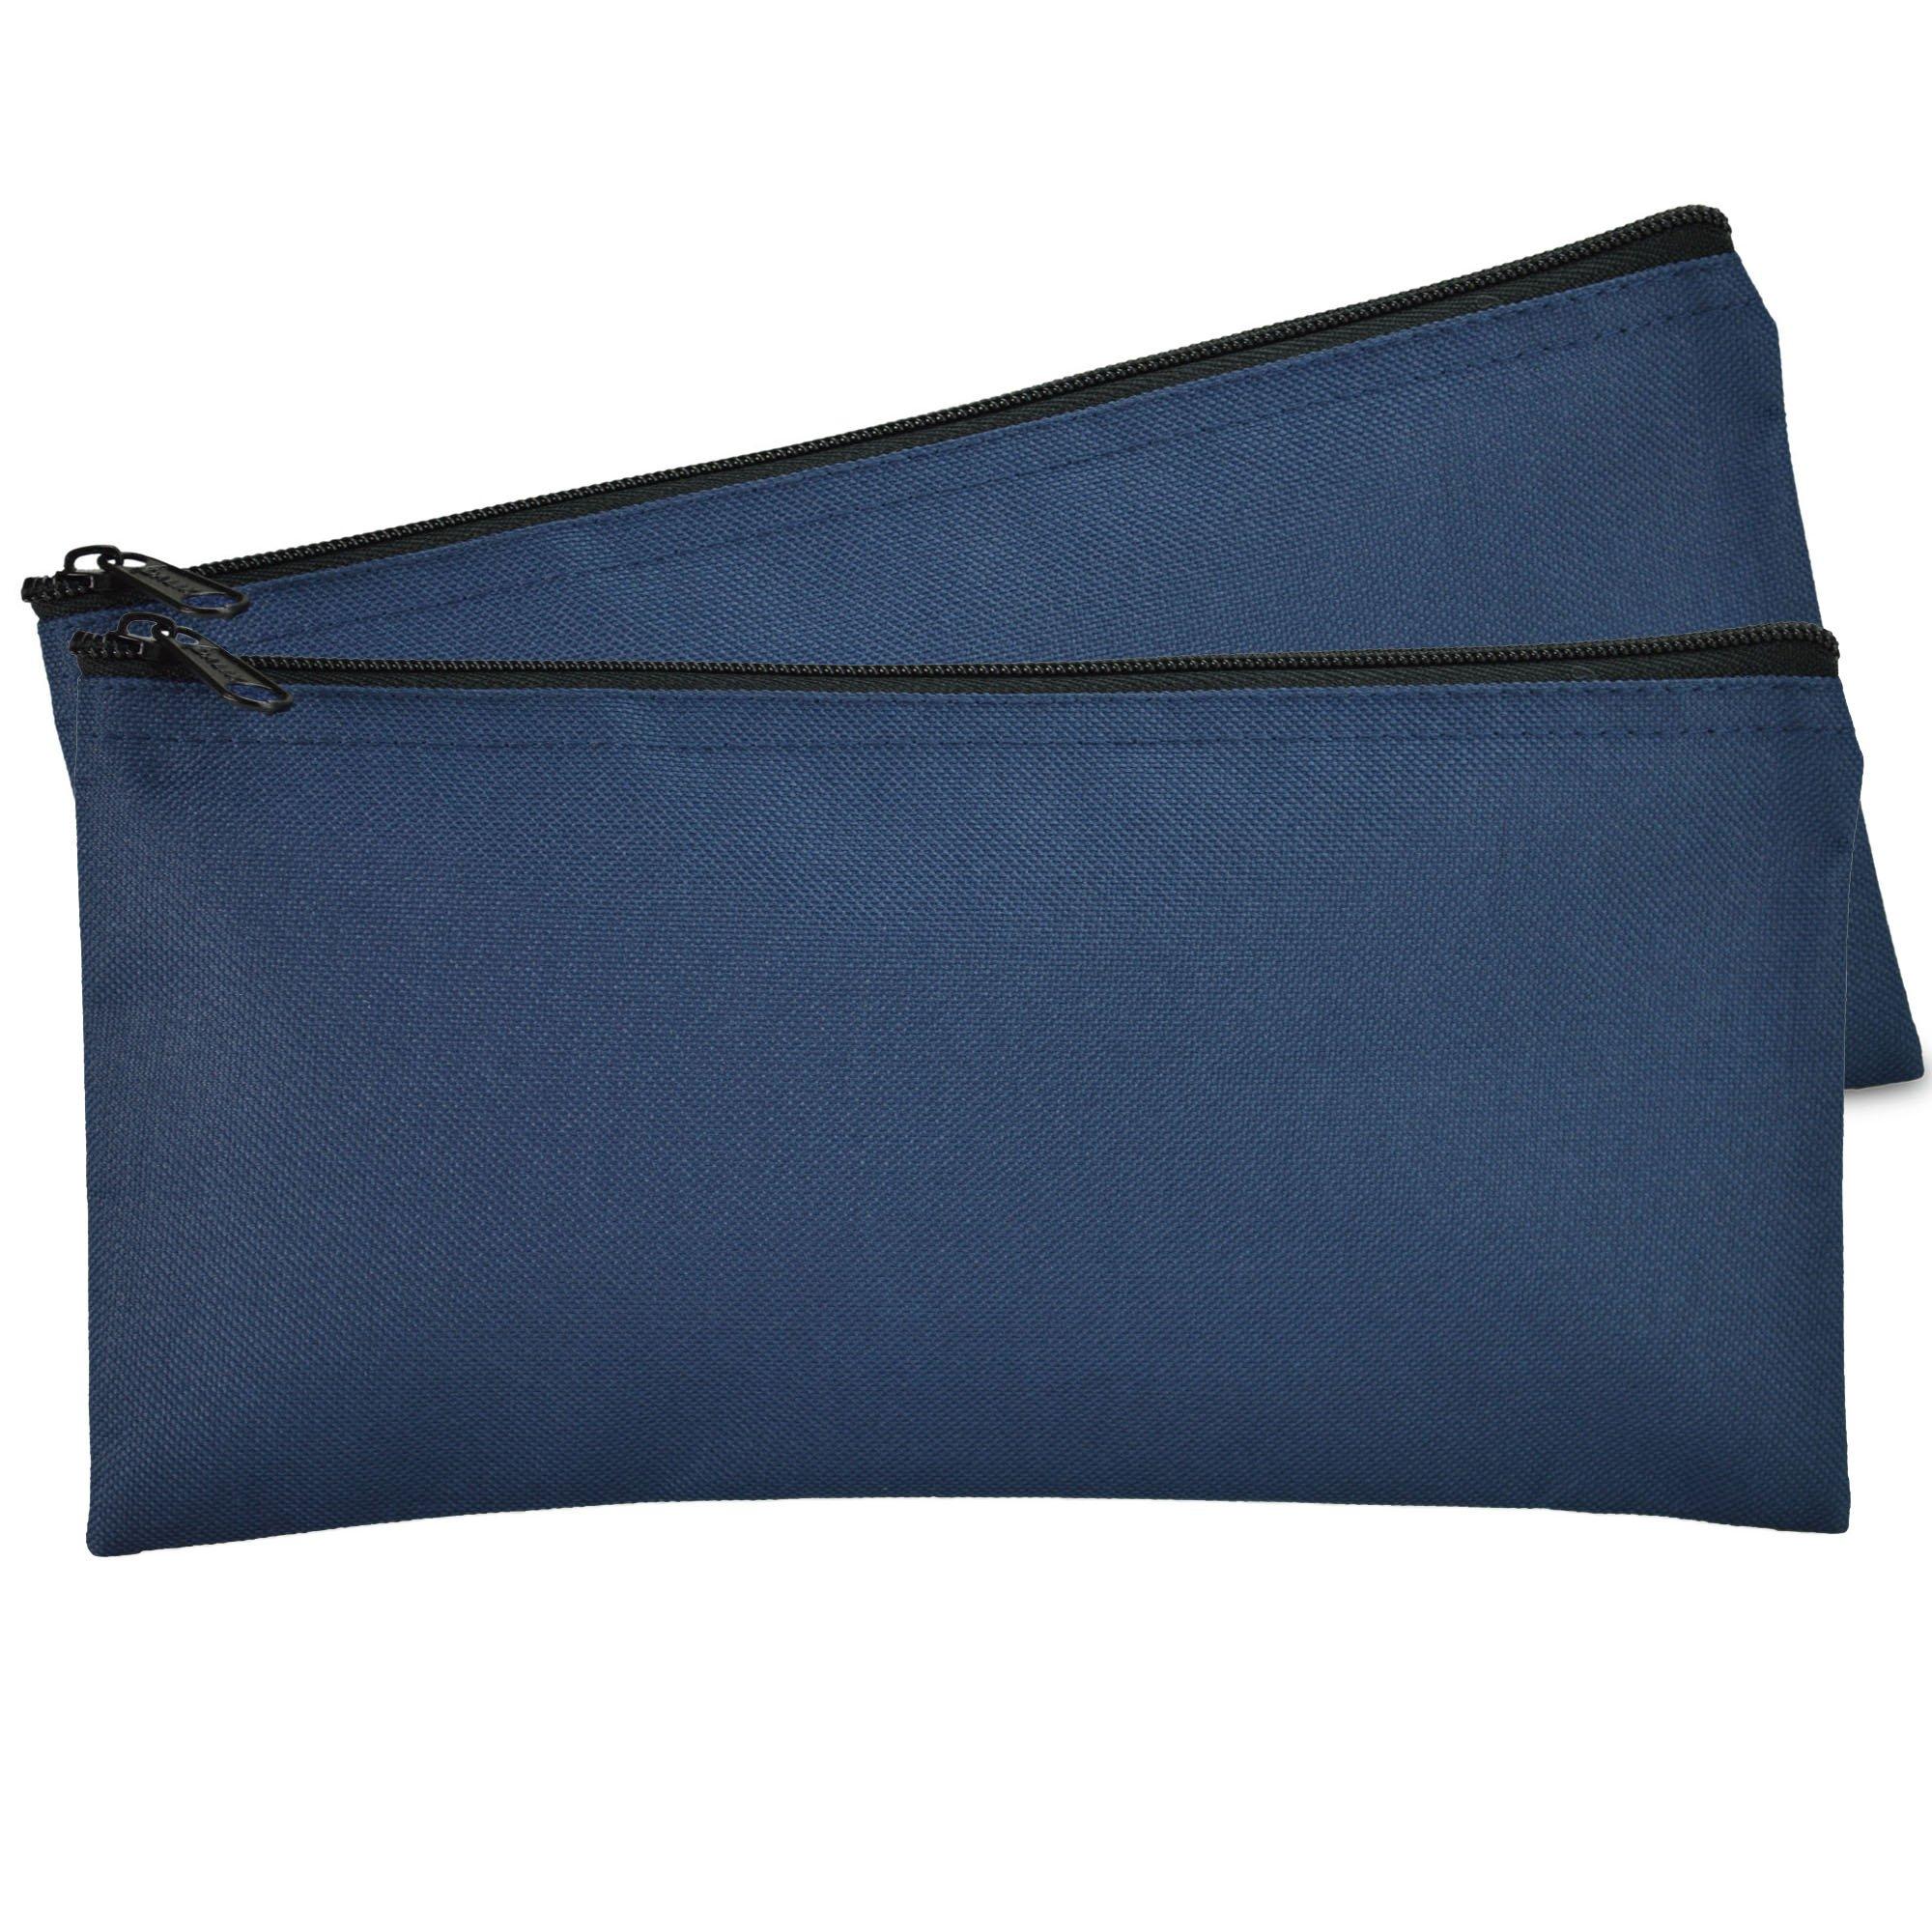 DALIX Bank Bags Money Pouch Security Deposit Utility Zipper Coin Bag Blue 2 Pack